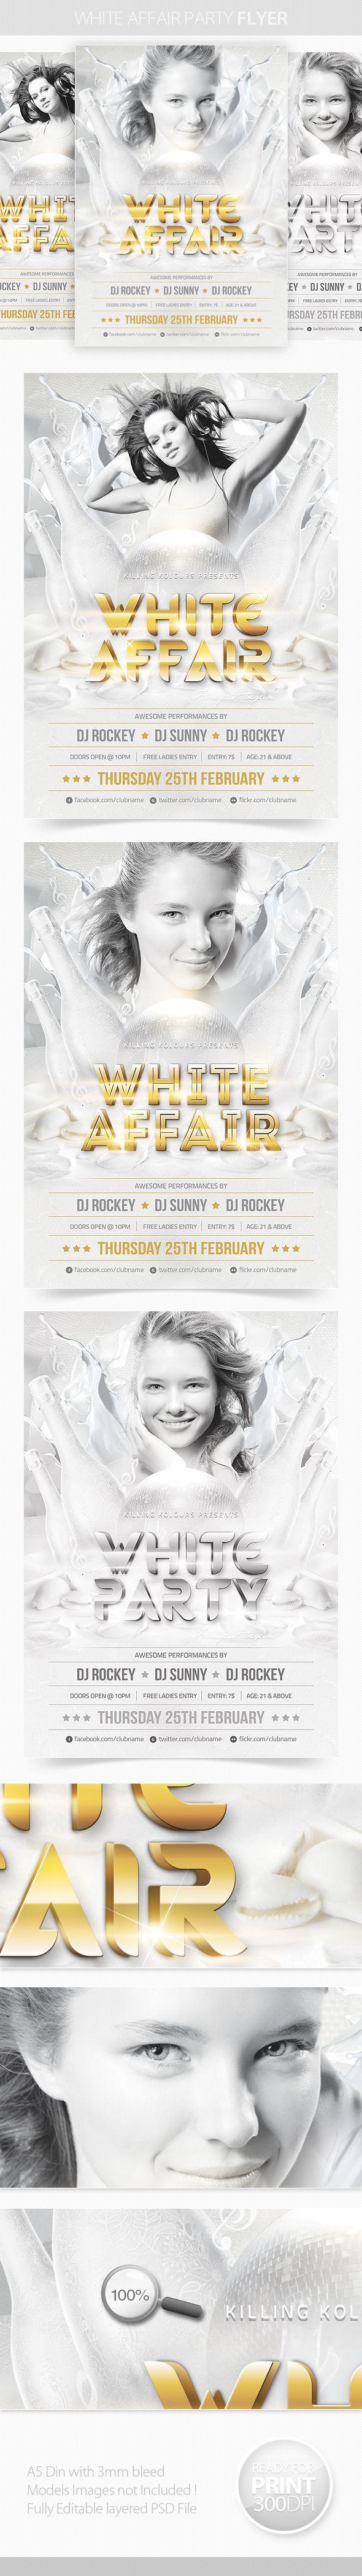 White Affair Party Flyer by Mahantesh Nagashetty, via Behance